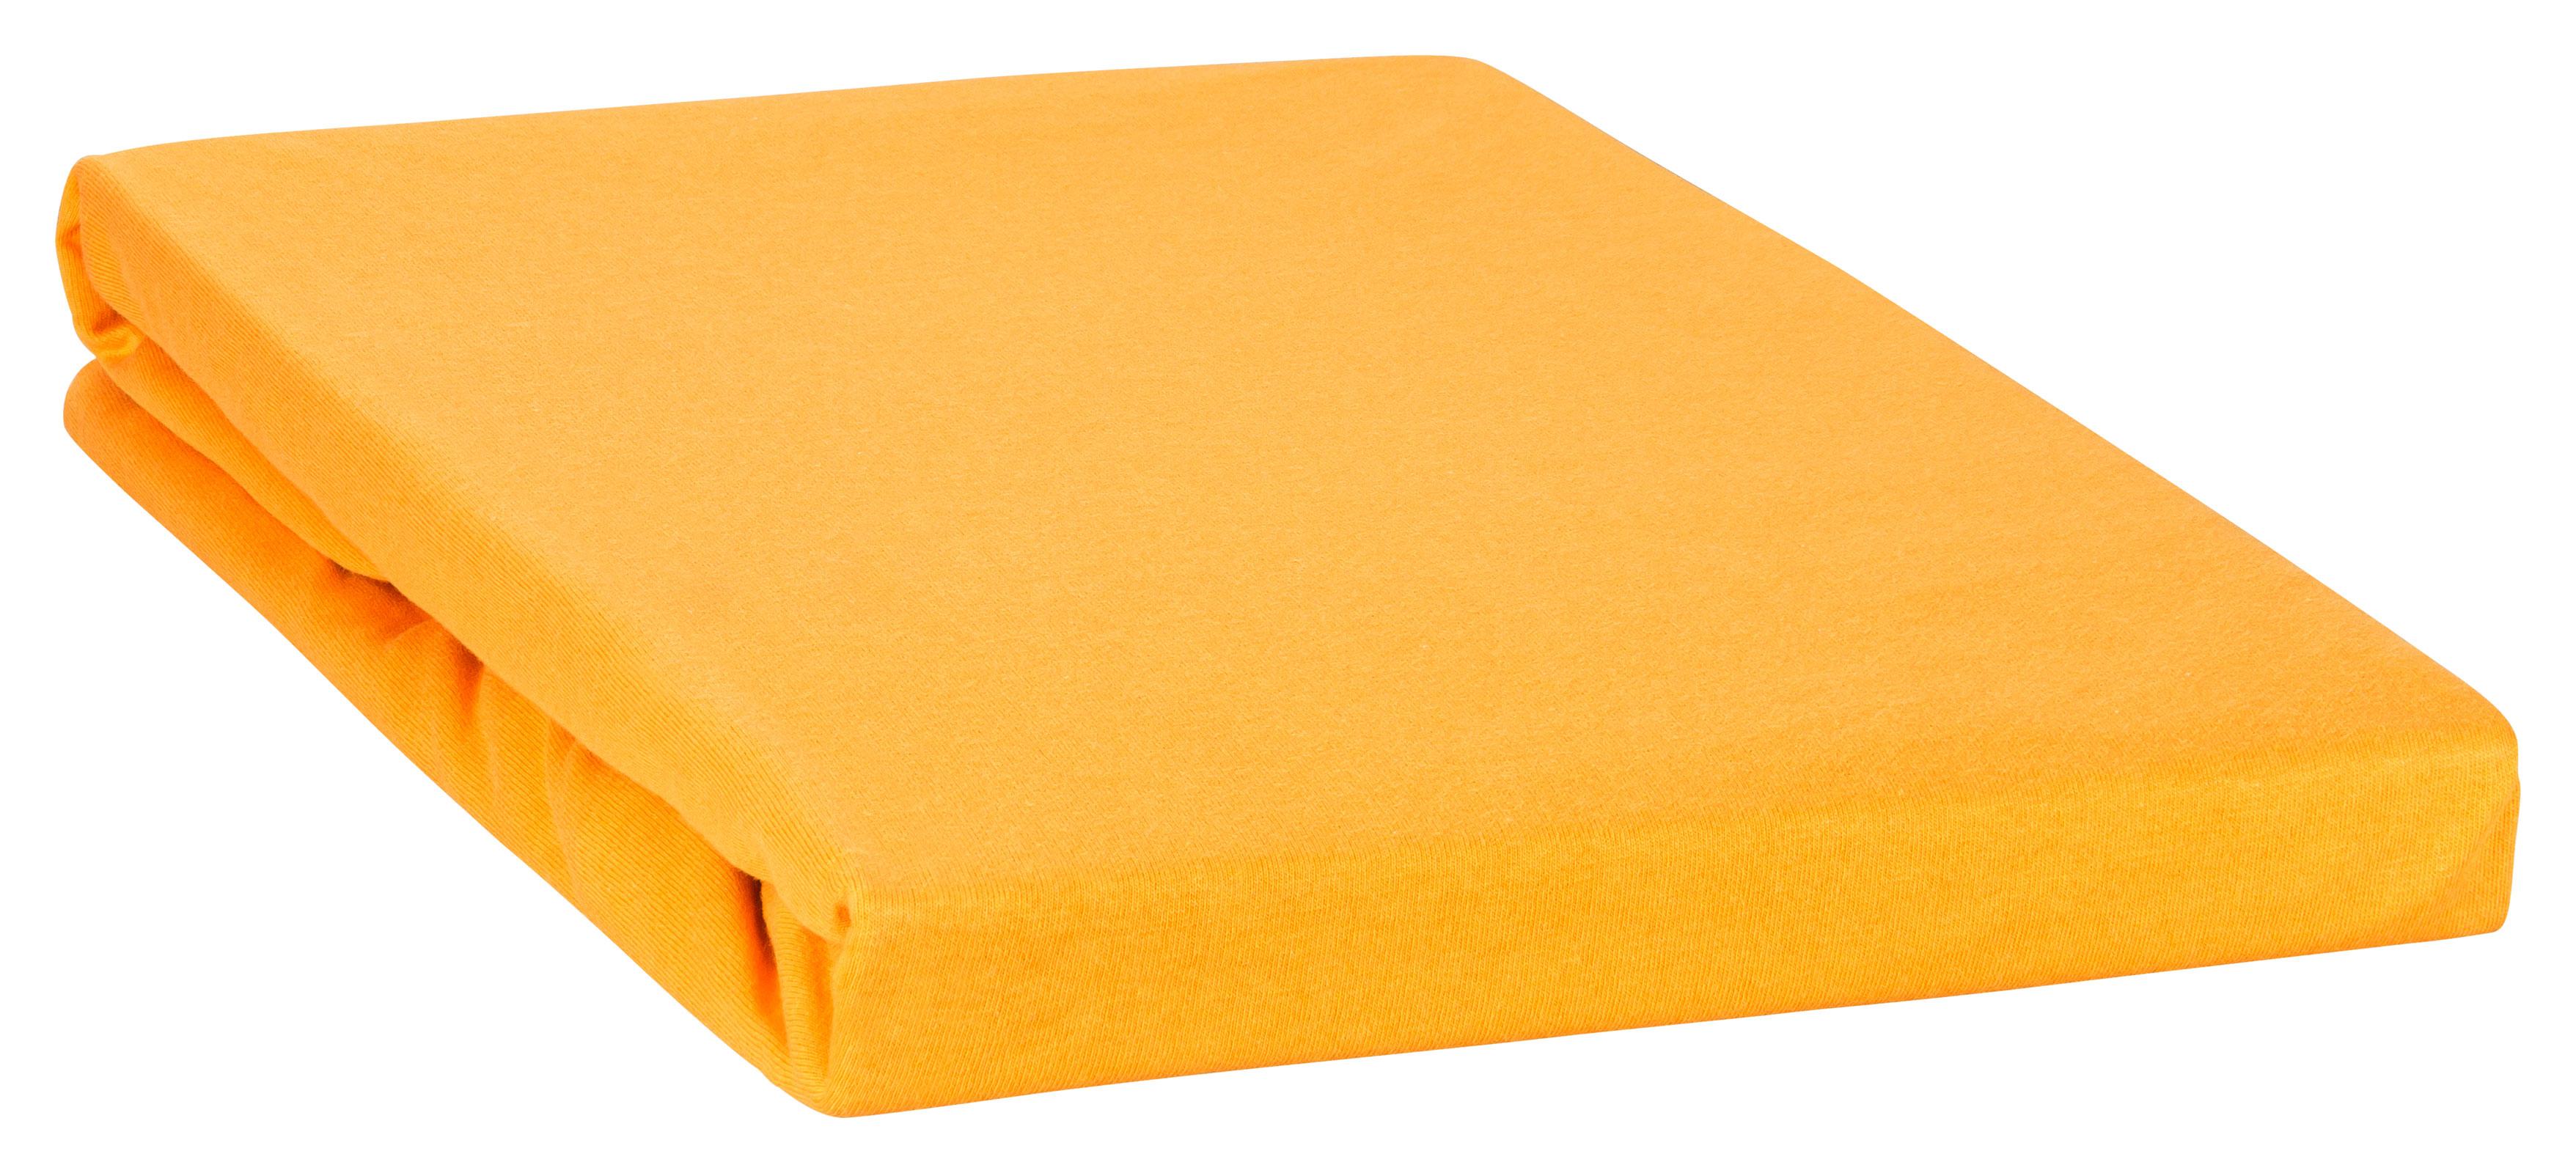 moon topper spannbettlaken boxspringbett spannbetttuch. Black Bedroom Furniture Sets. Home Design Ideas